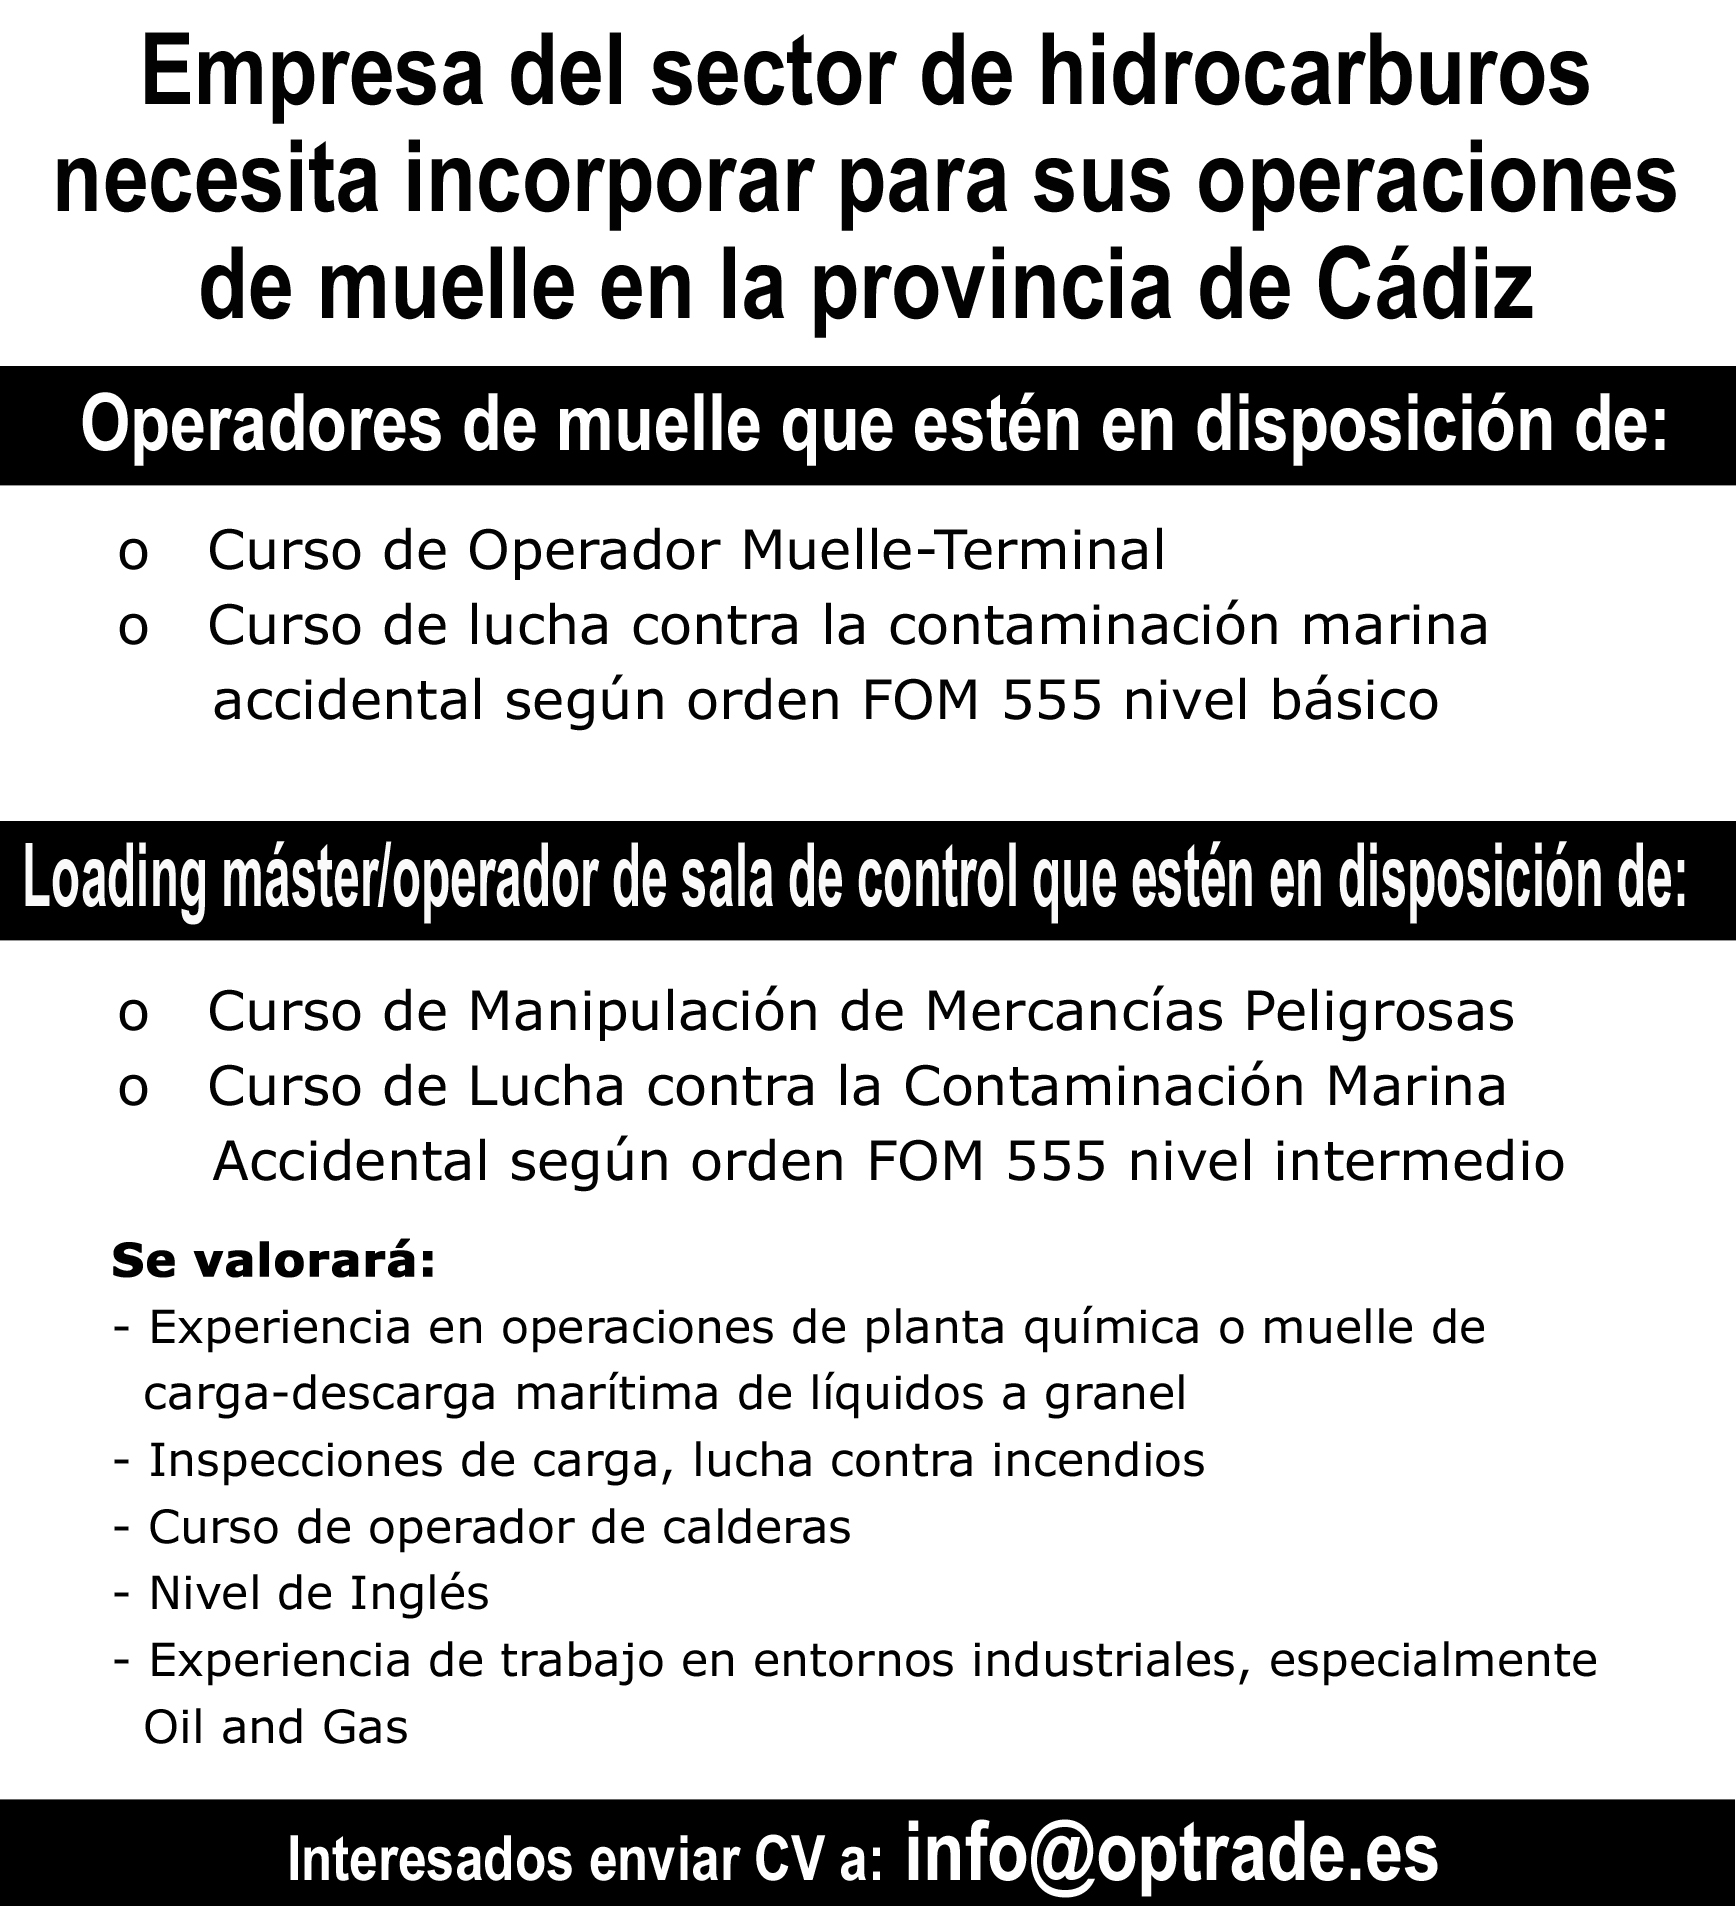 http://www.europasur.es/comarca/Acerinox-instala-varias-pantallas ...